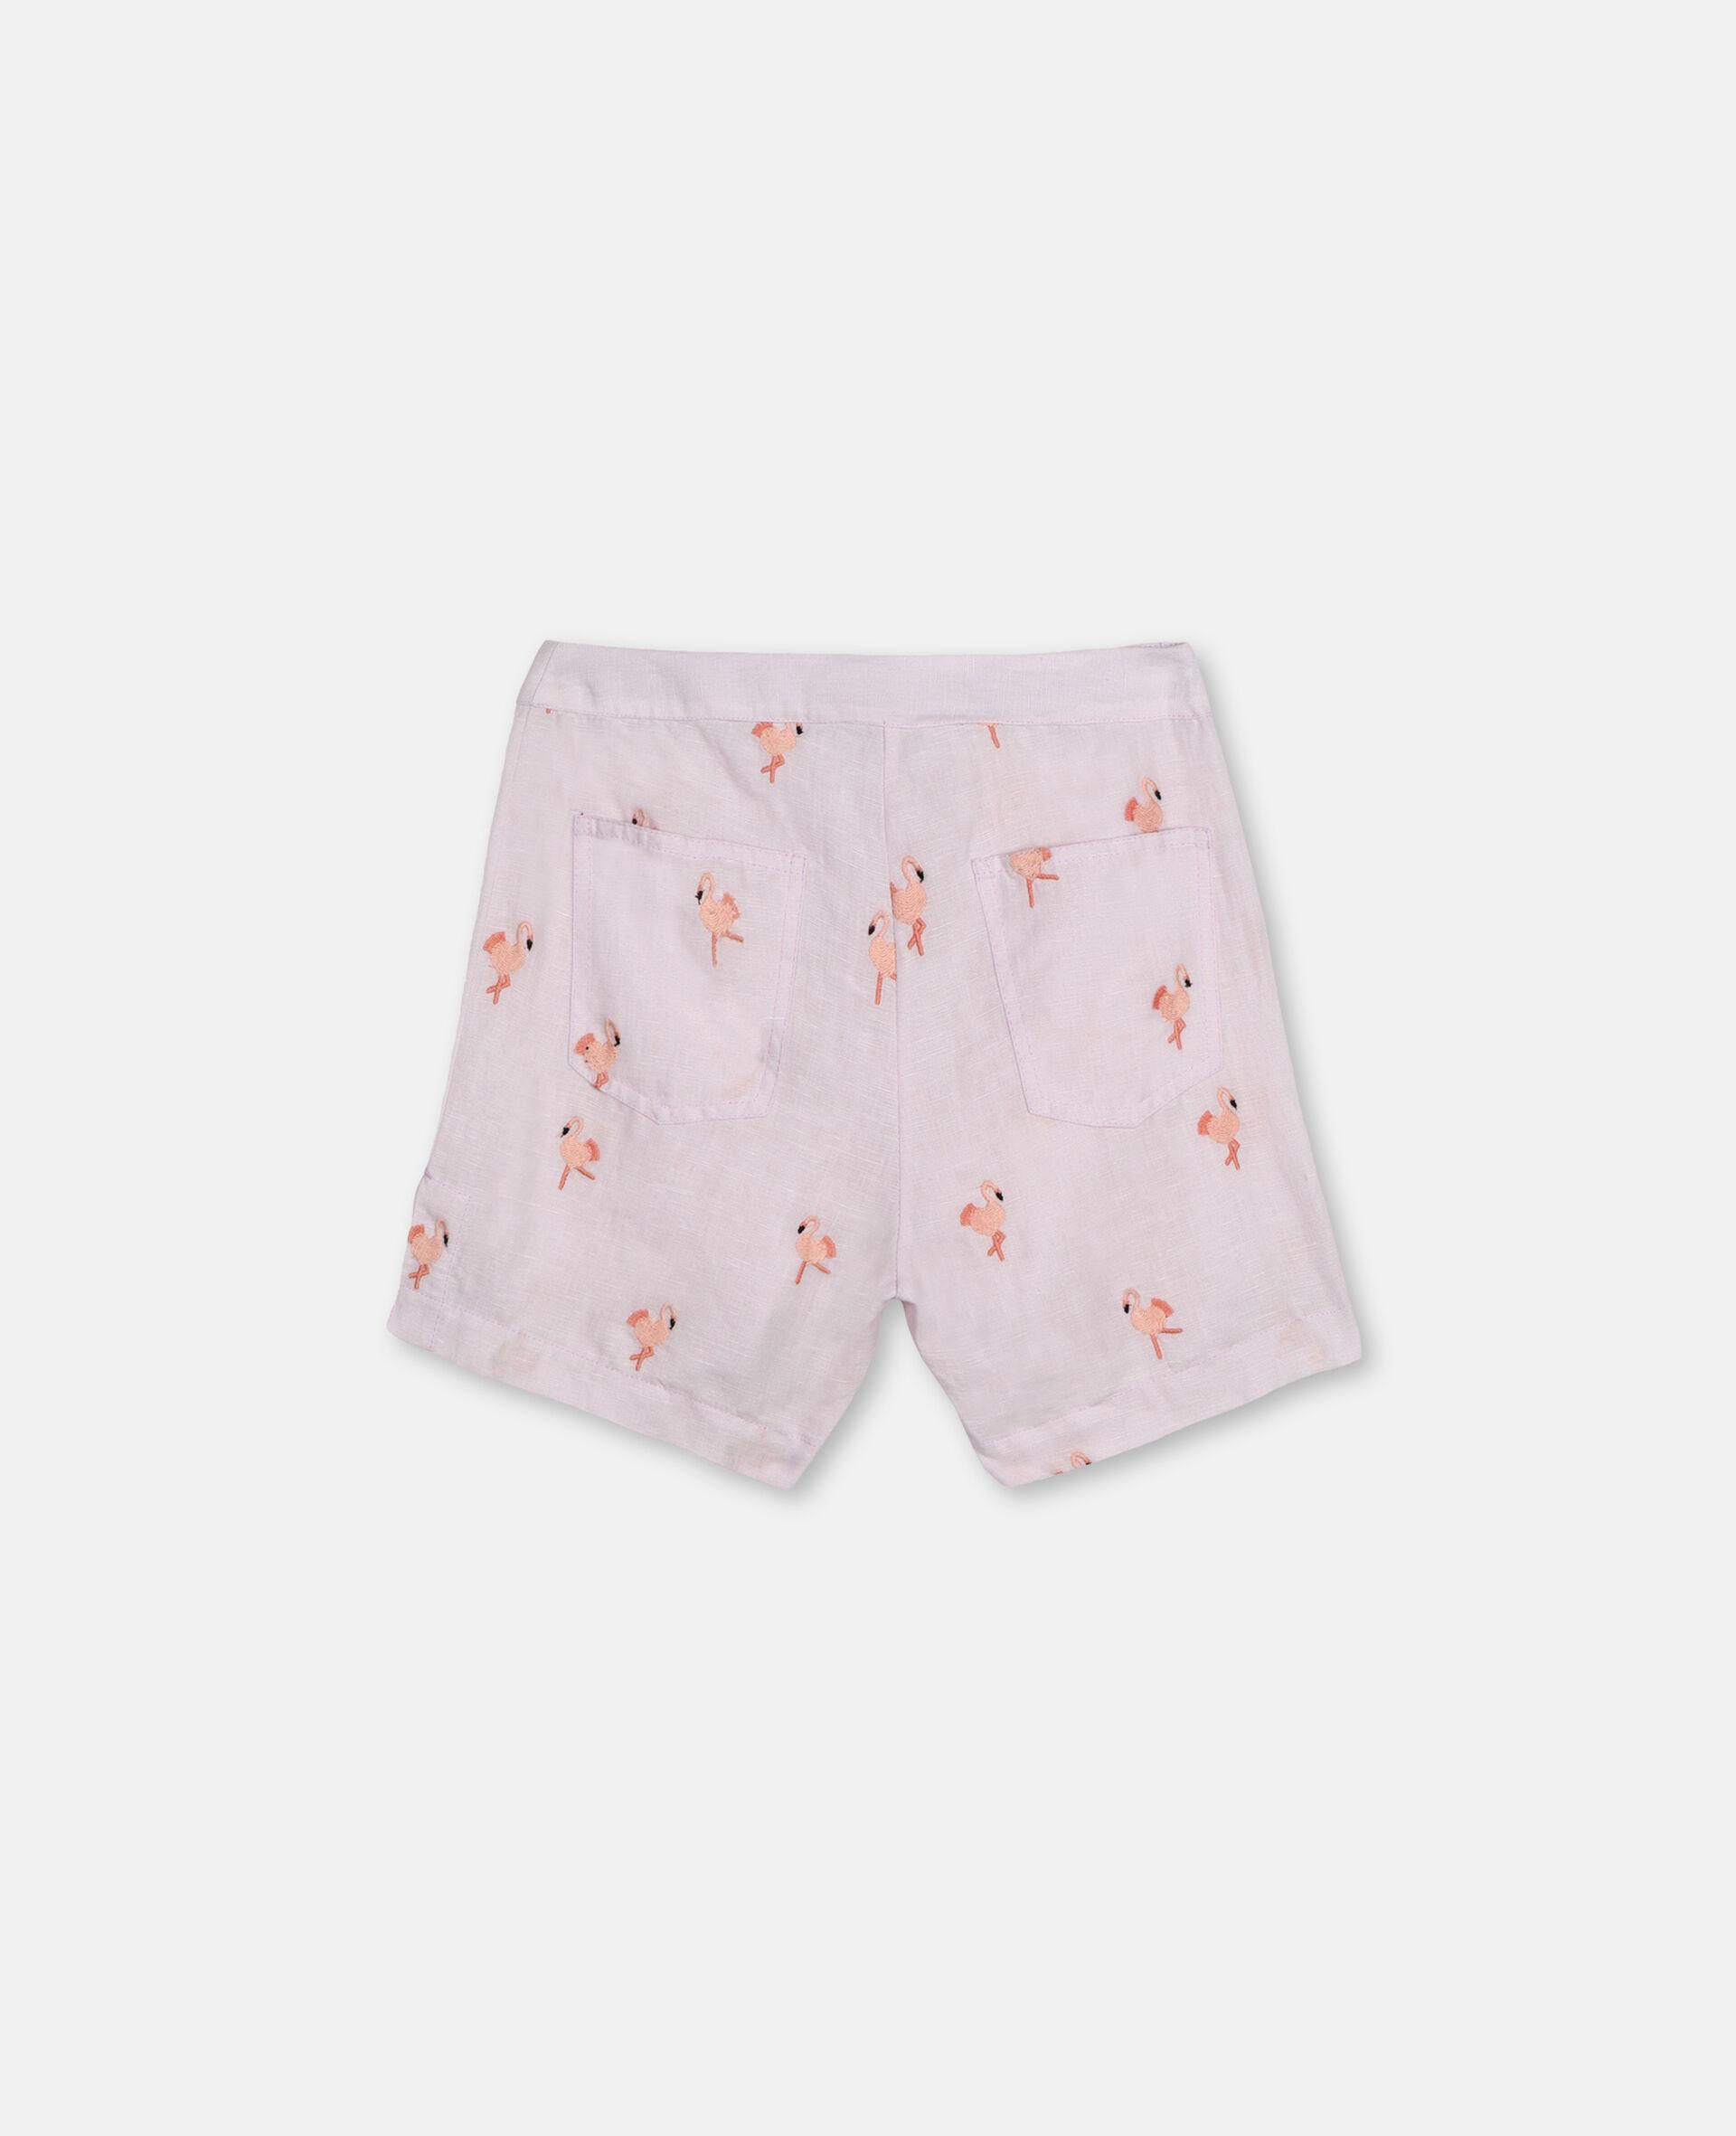 Flamingo刺绣短裤 -粉色-large image number 3